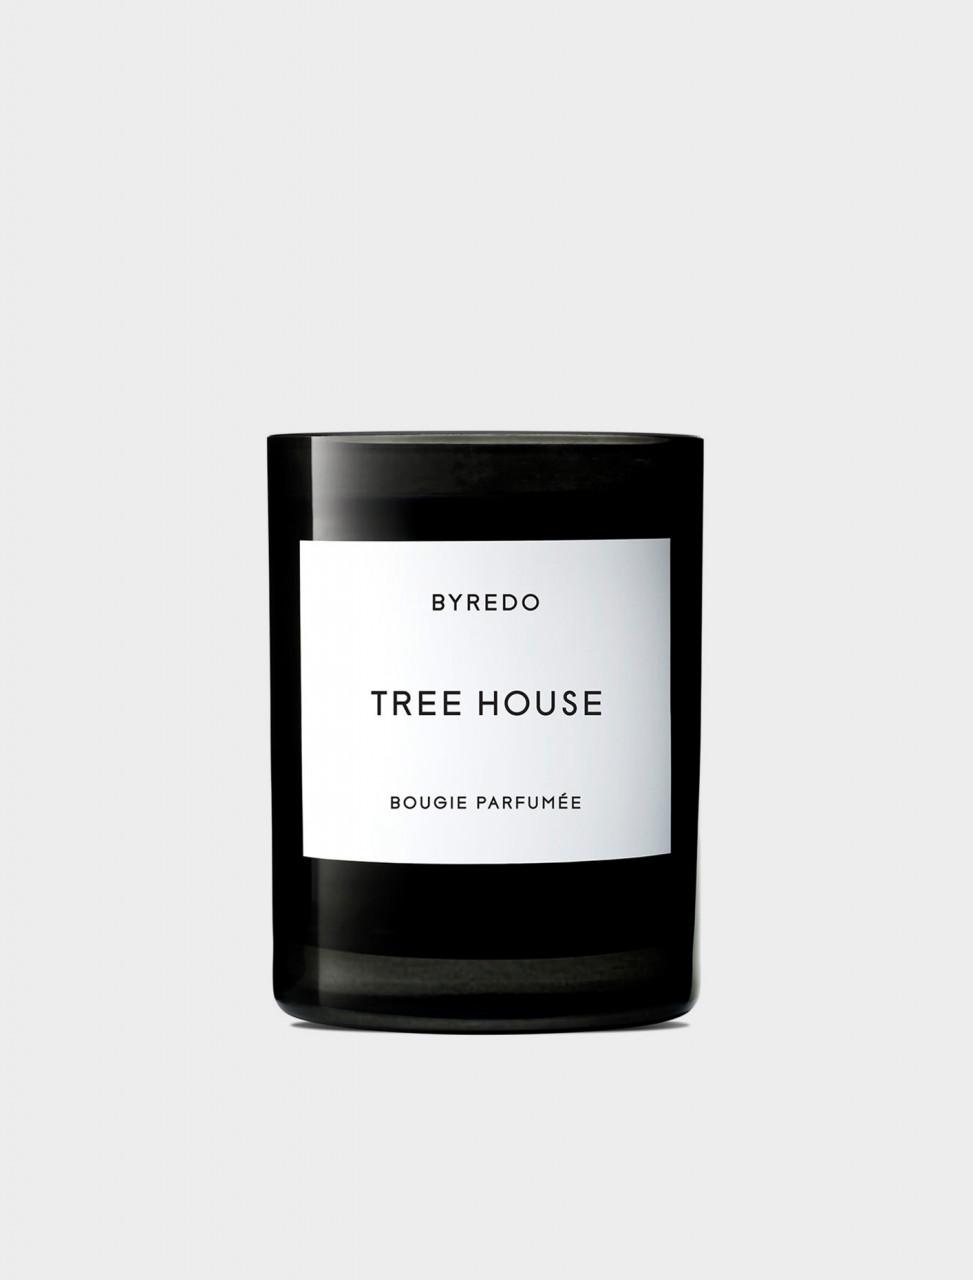 338-20020011 BYREDO TREE HOUSE CANDLE 240